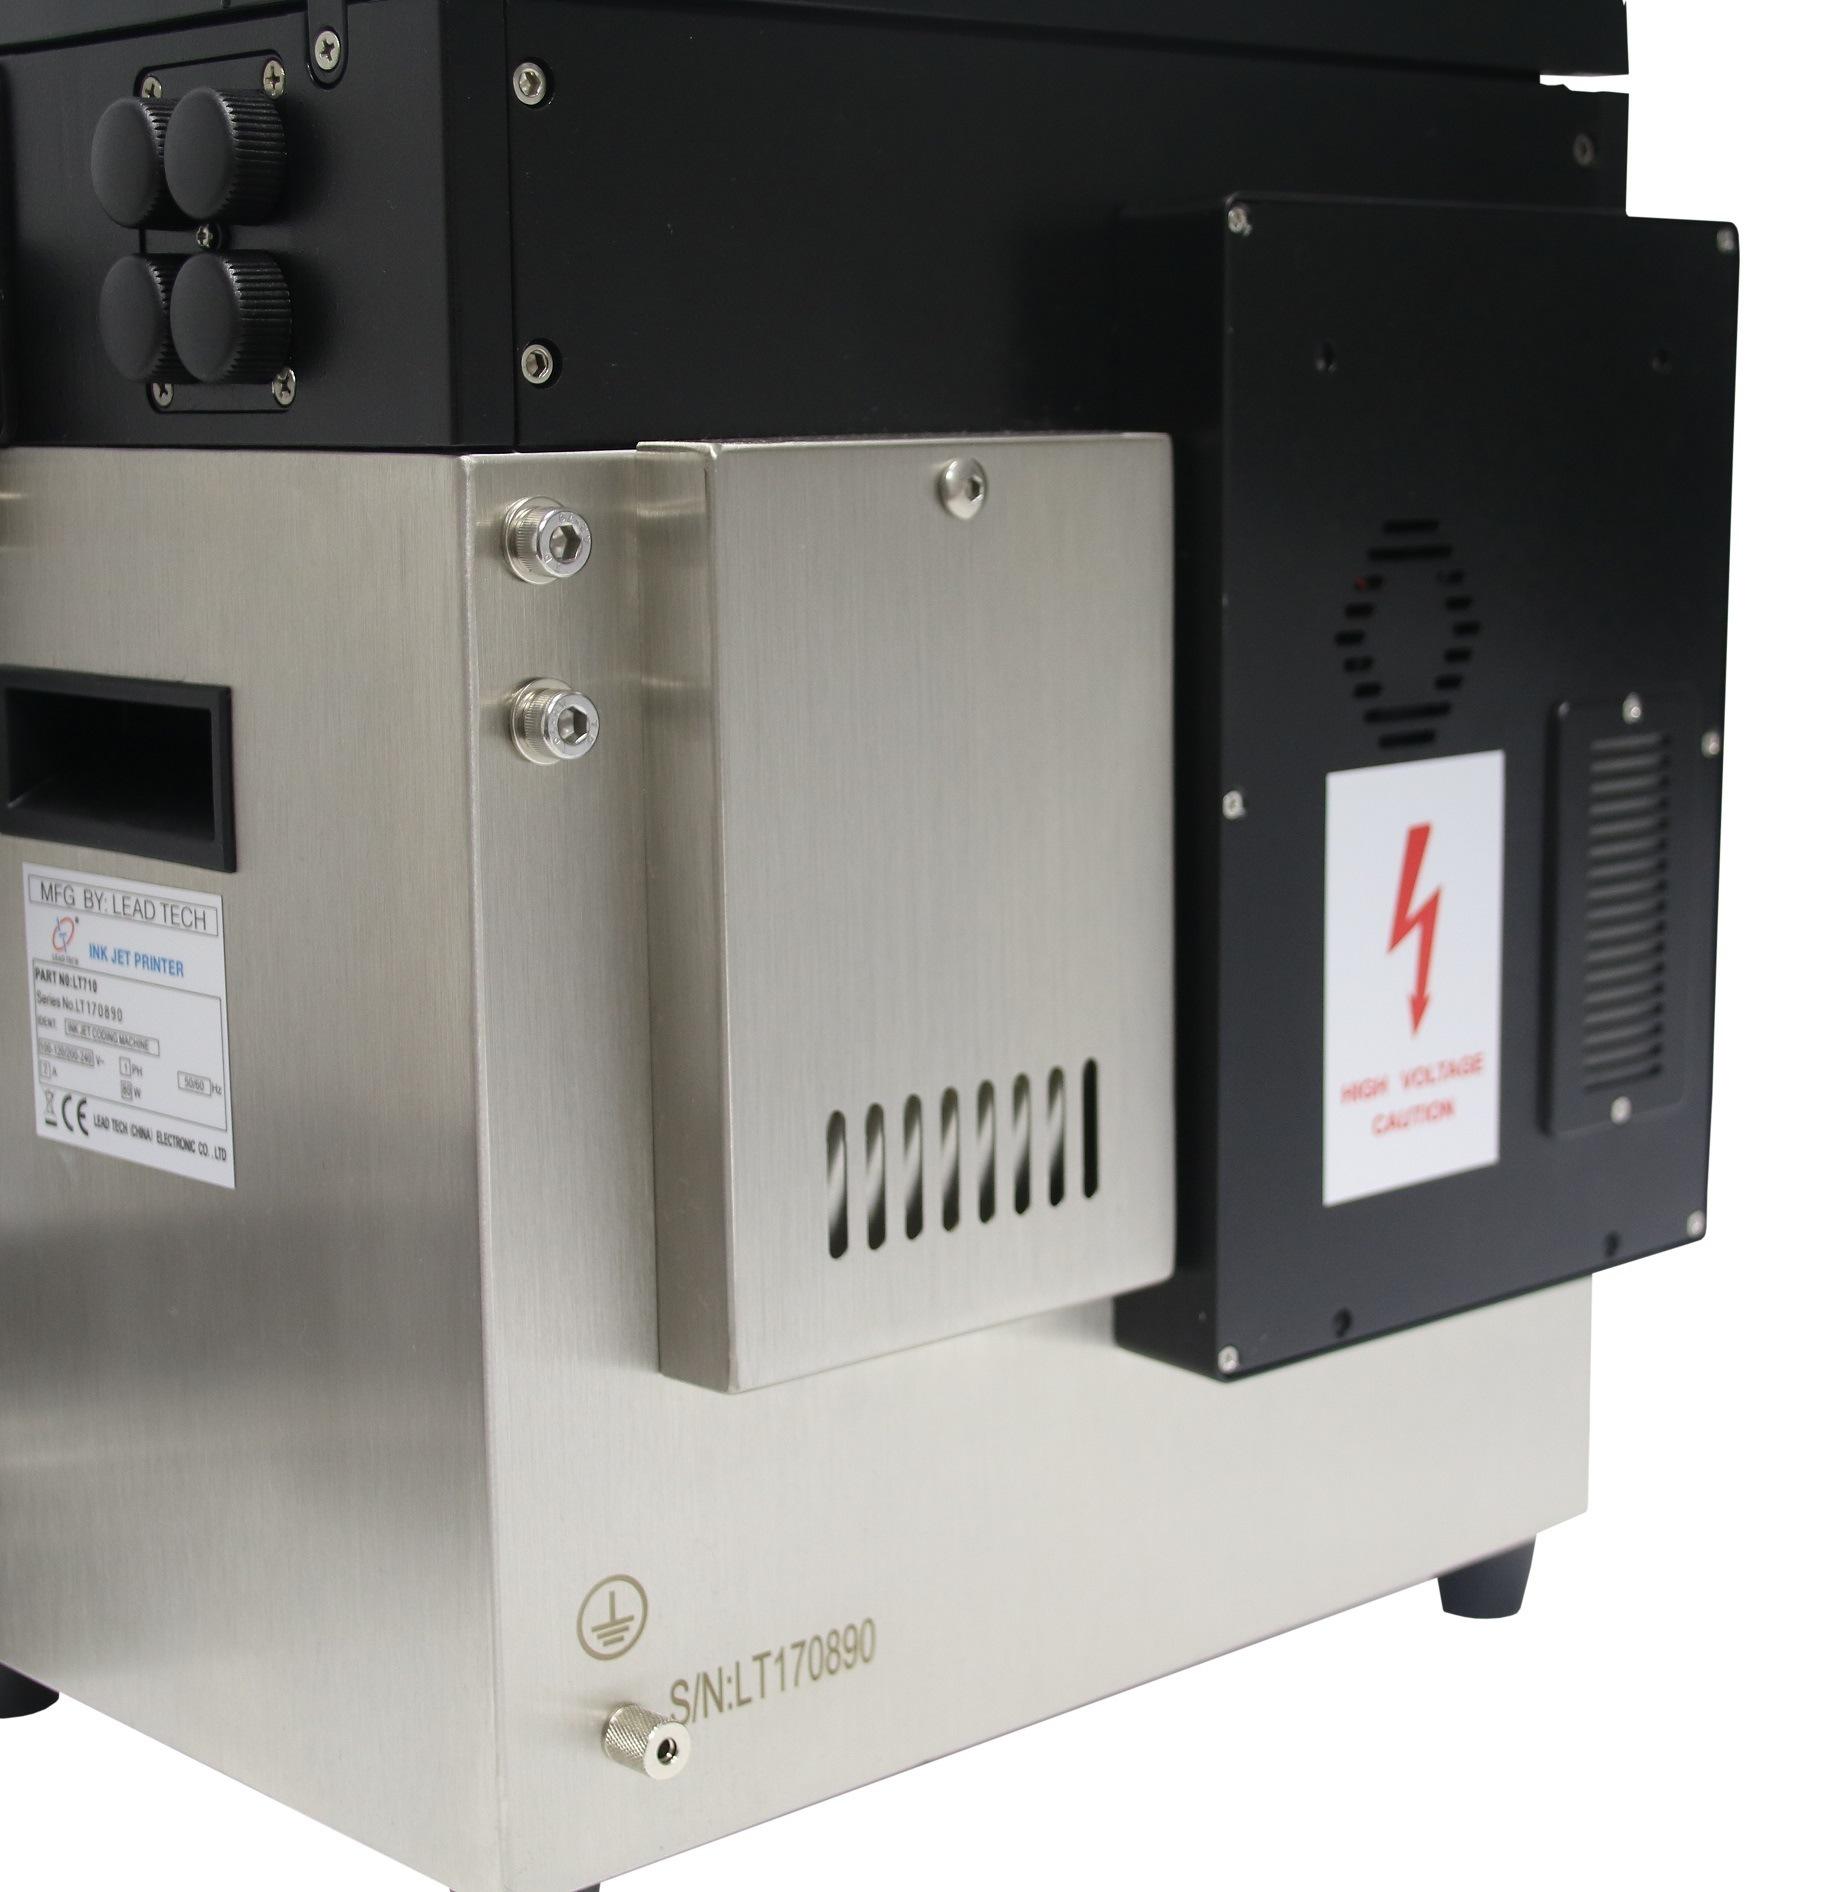 Lead Tech Lt760 Black to Blue Printing Inkjet Printer